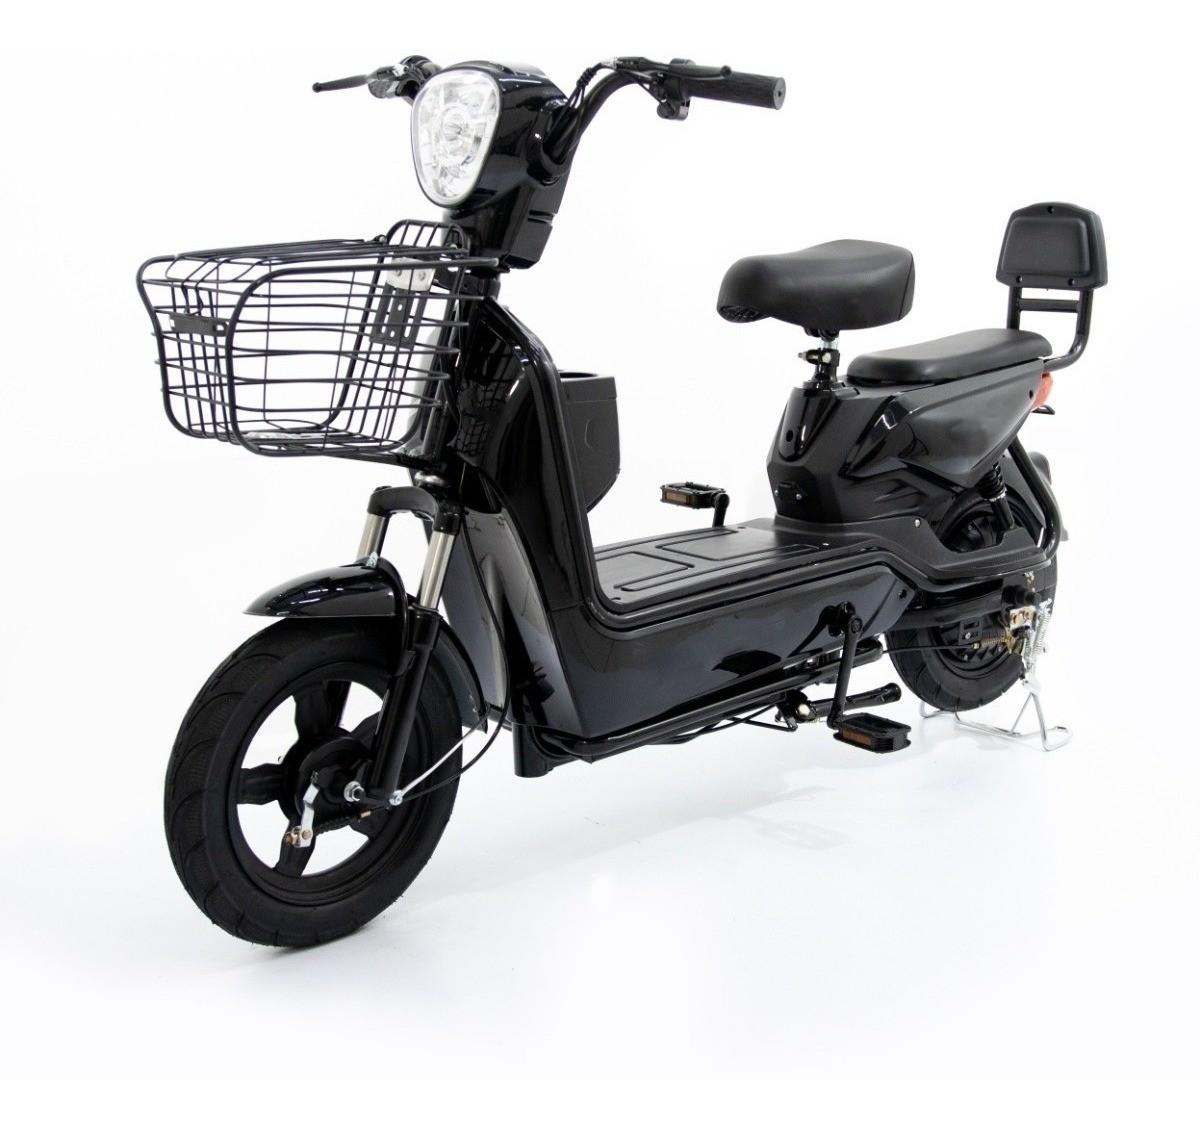 Bicicleta Elétrica 350w 48v Ecobikes Smart bateria chumbo